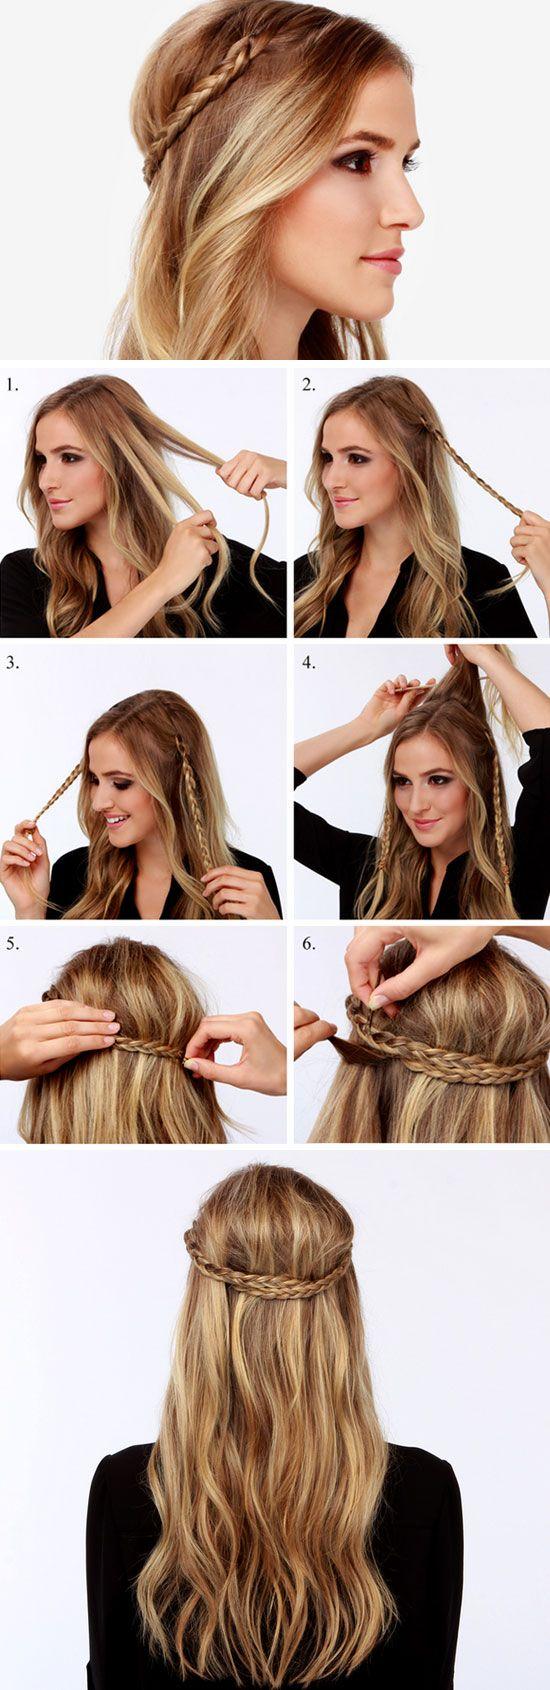 18 No Heat Hairstyles